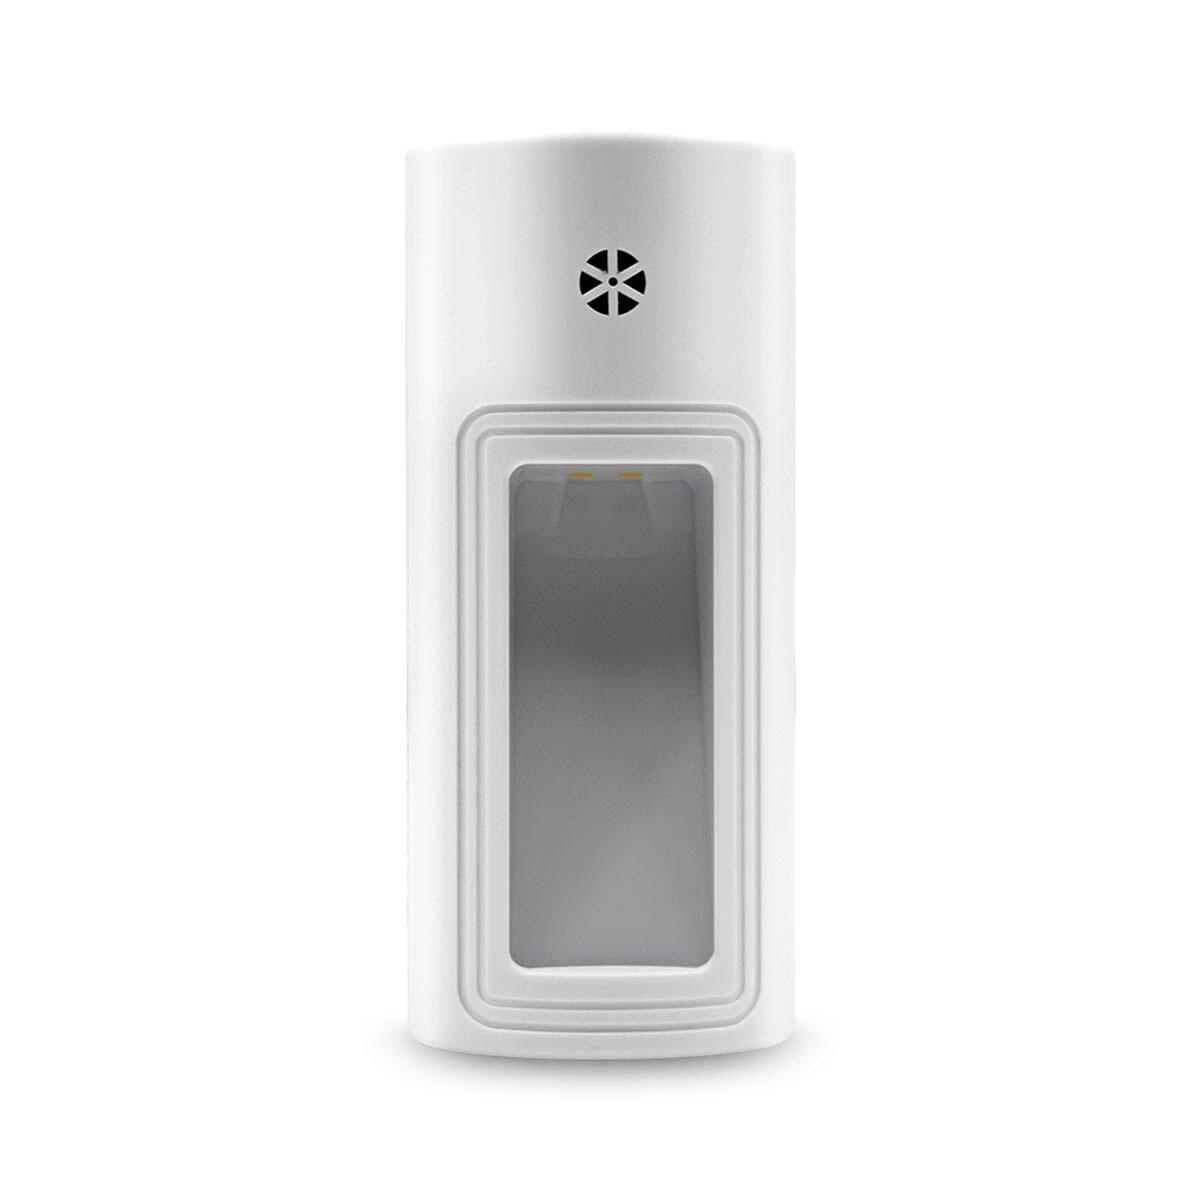 Motion Sensor Control Led Night Lights With EU US Plug Square Shape Home Babyroom Bathroom  Bedroom Desk Table Decoration Lamp